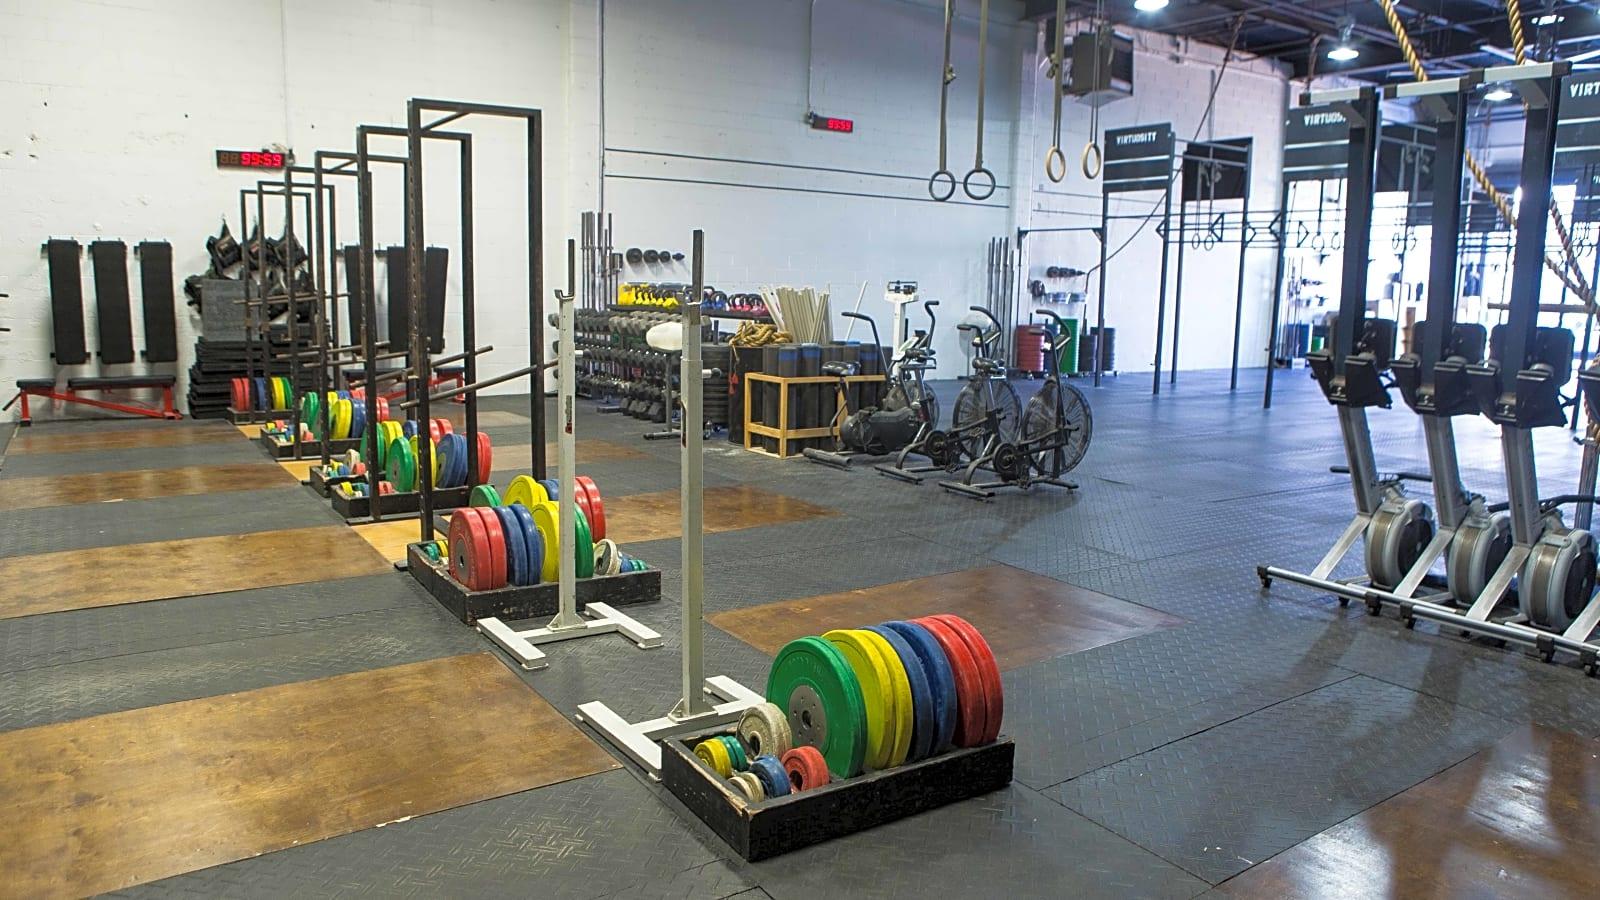 Fitness warehouse & garage gym event space williamsburg new york